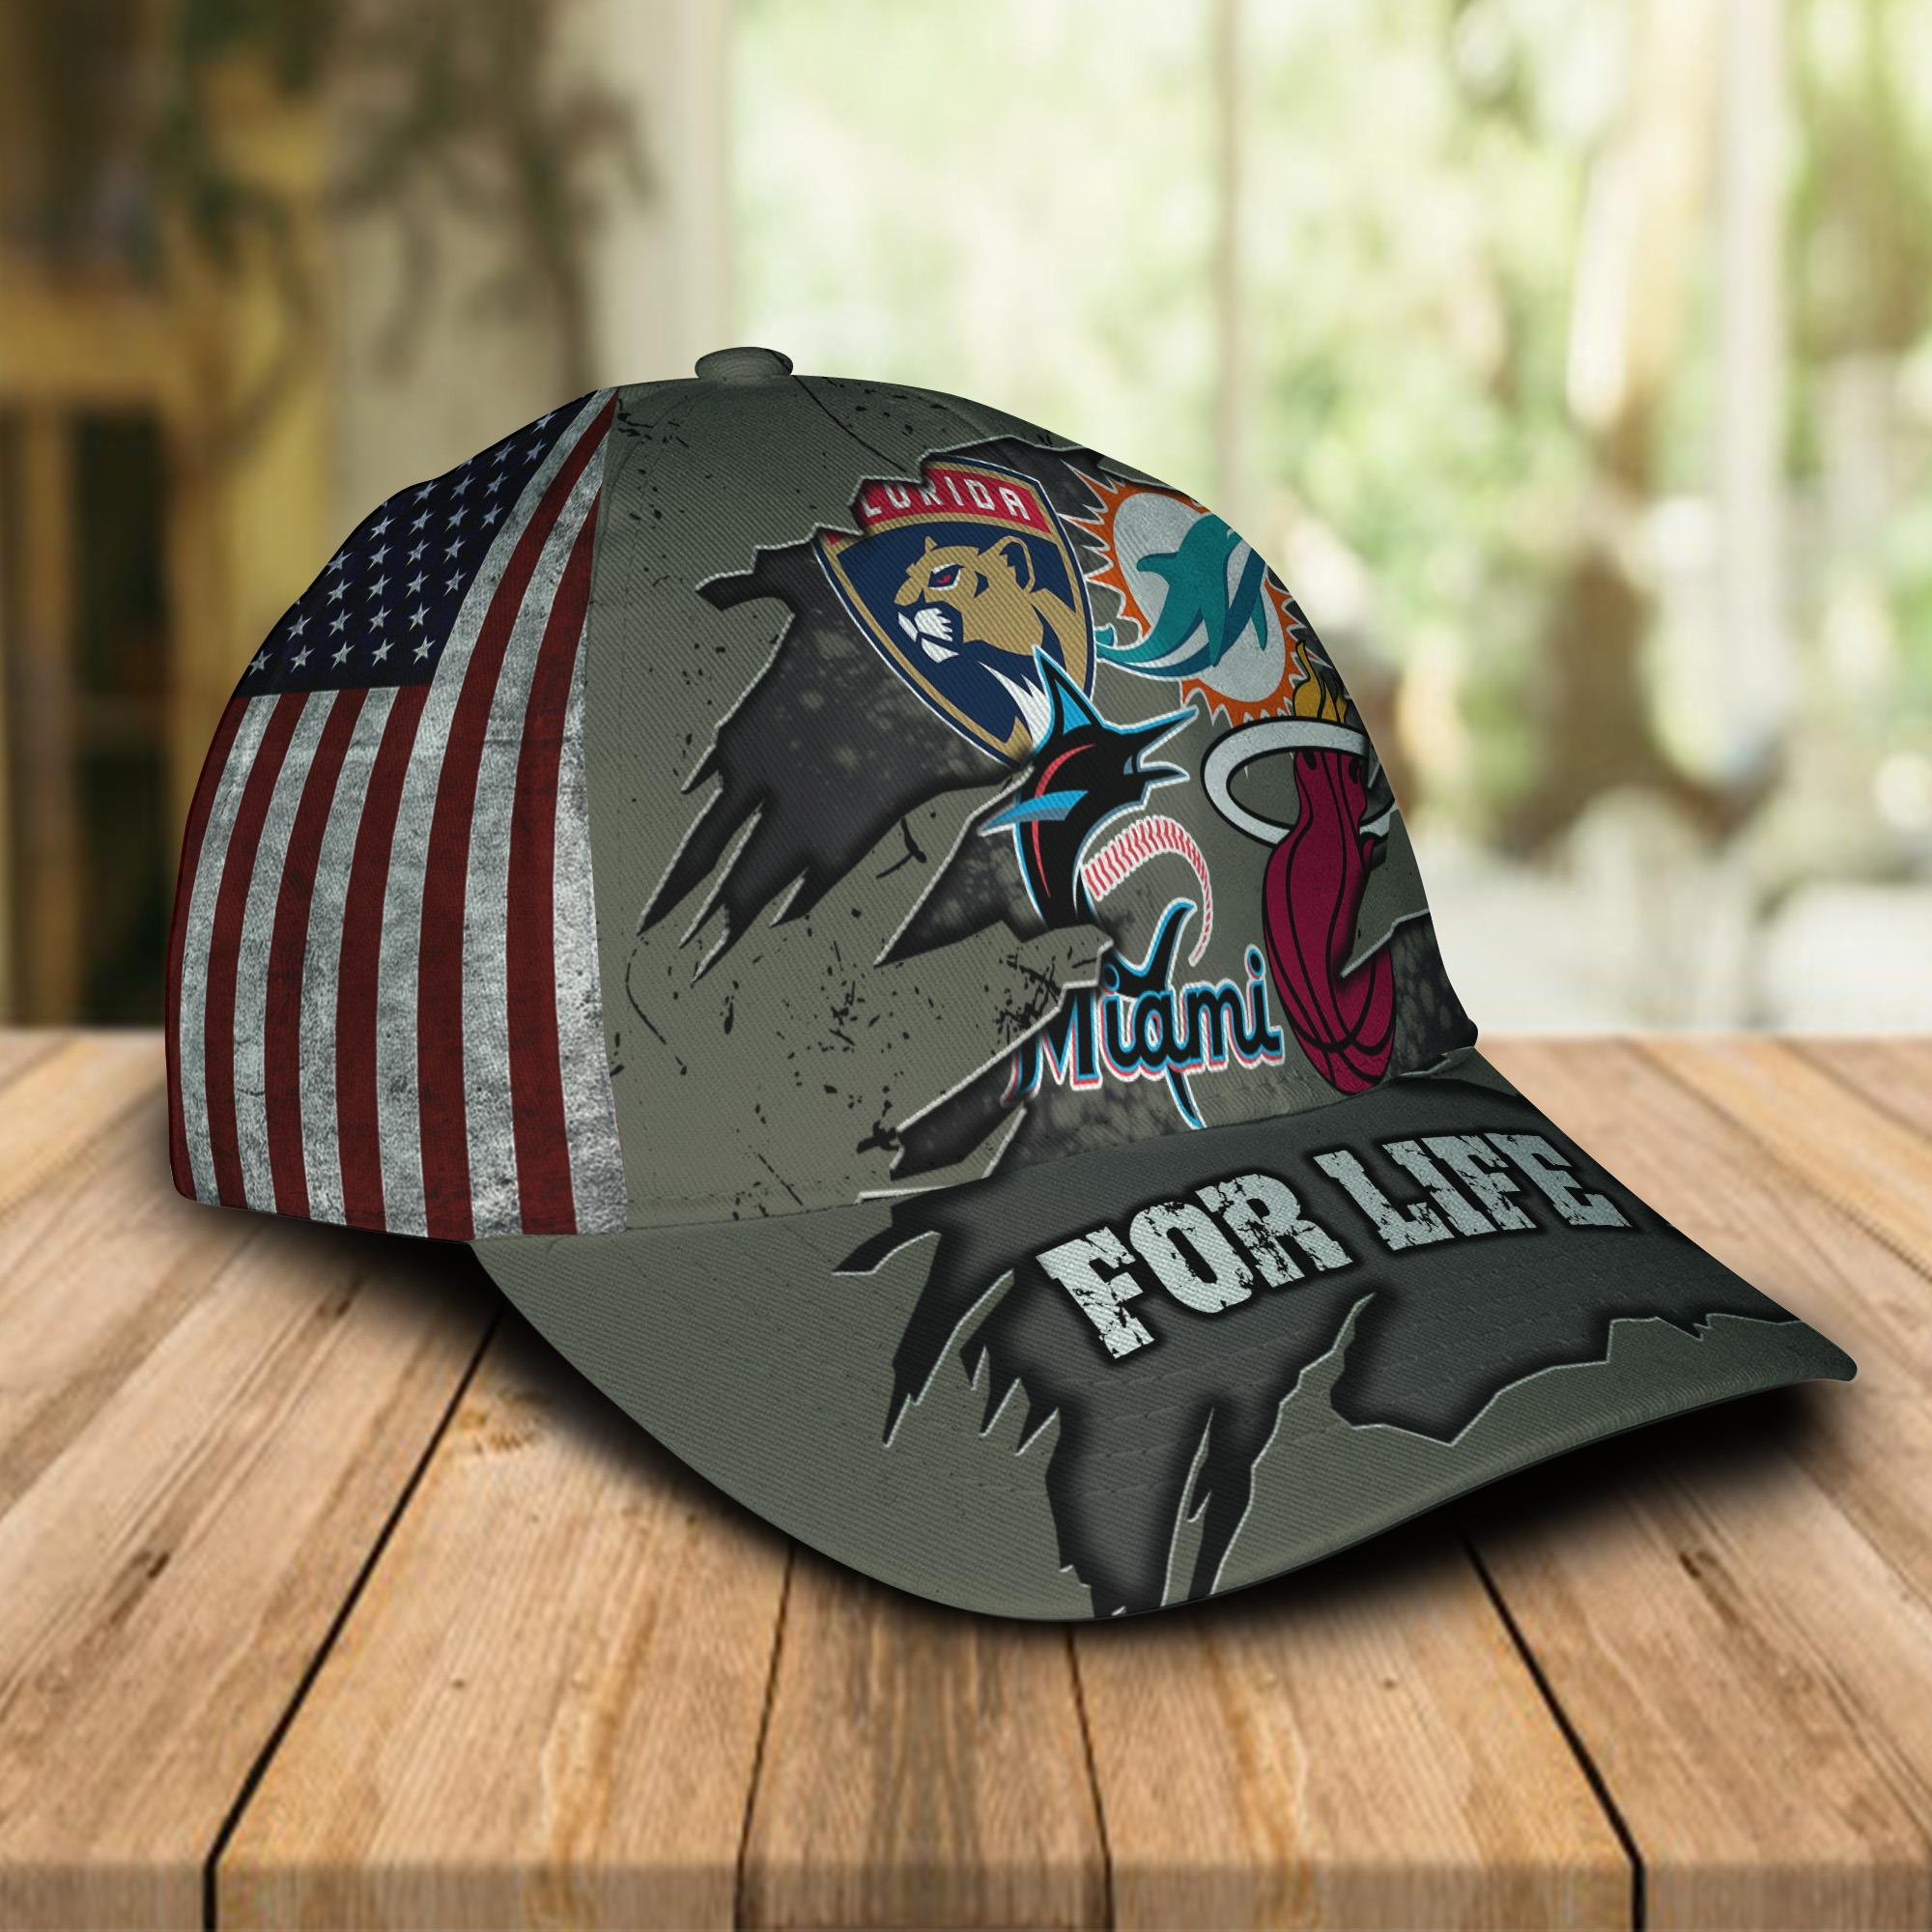 Miami Dolphins Miami Marlins Miami Heat Florida Panthers For Life Cap 1